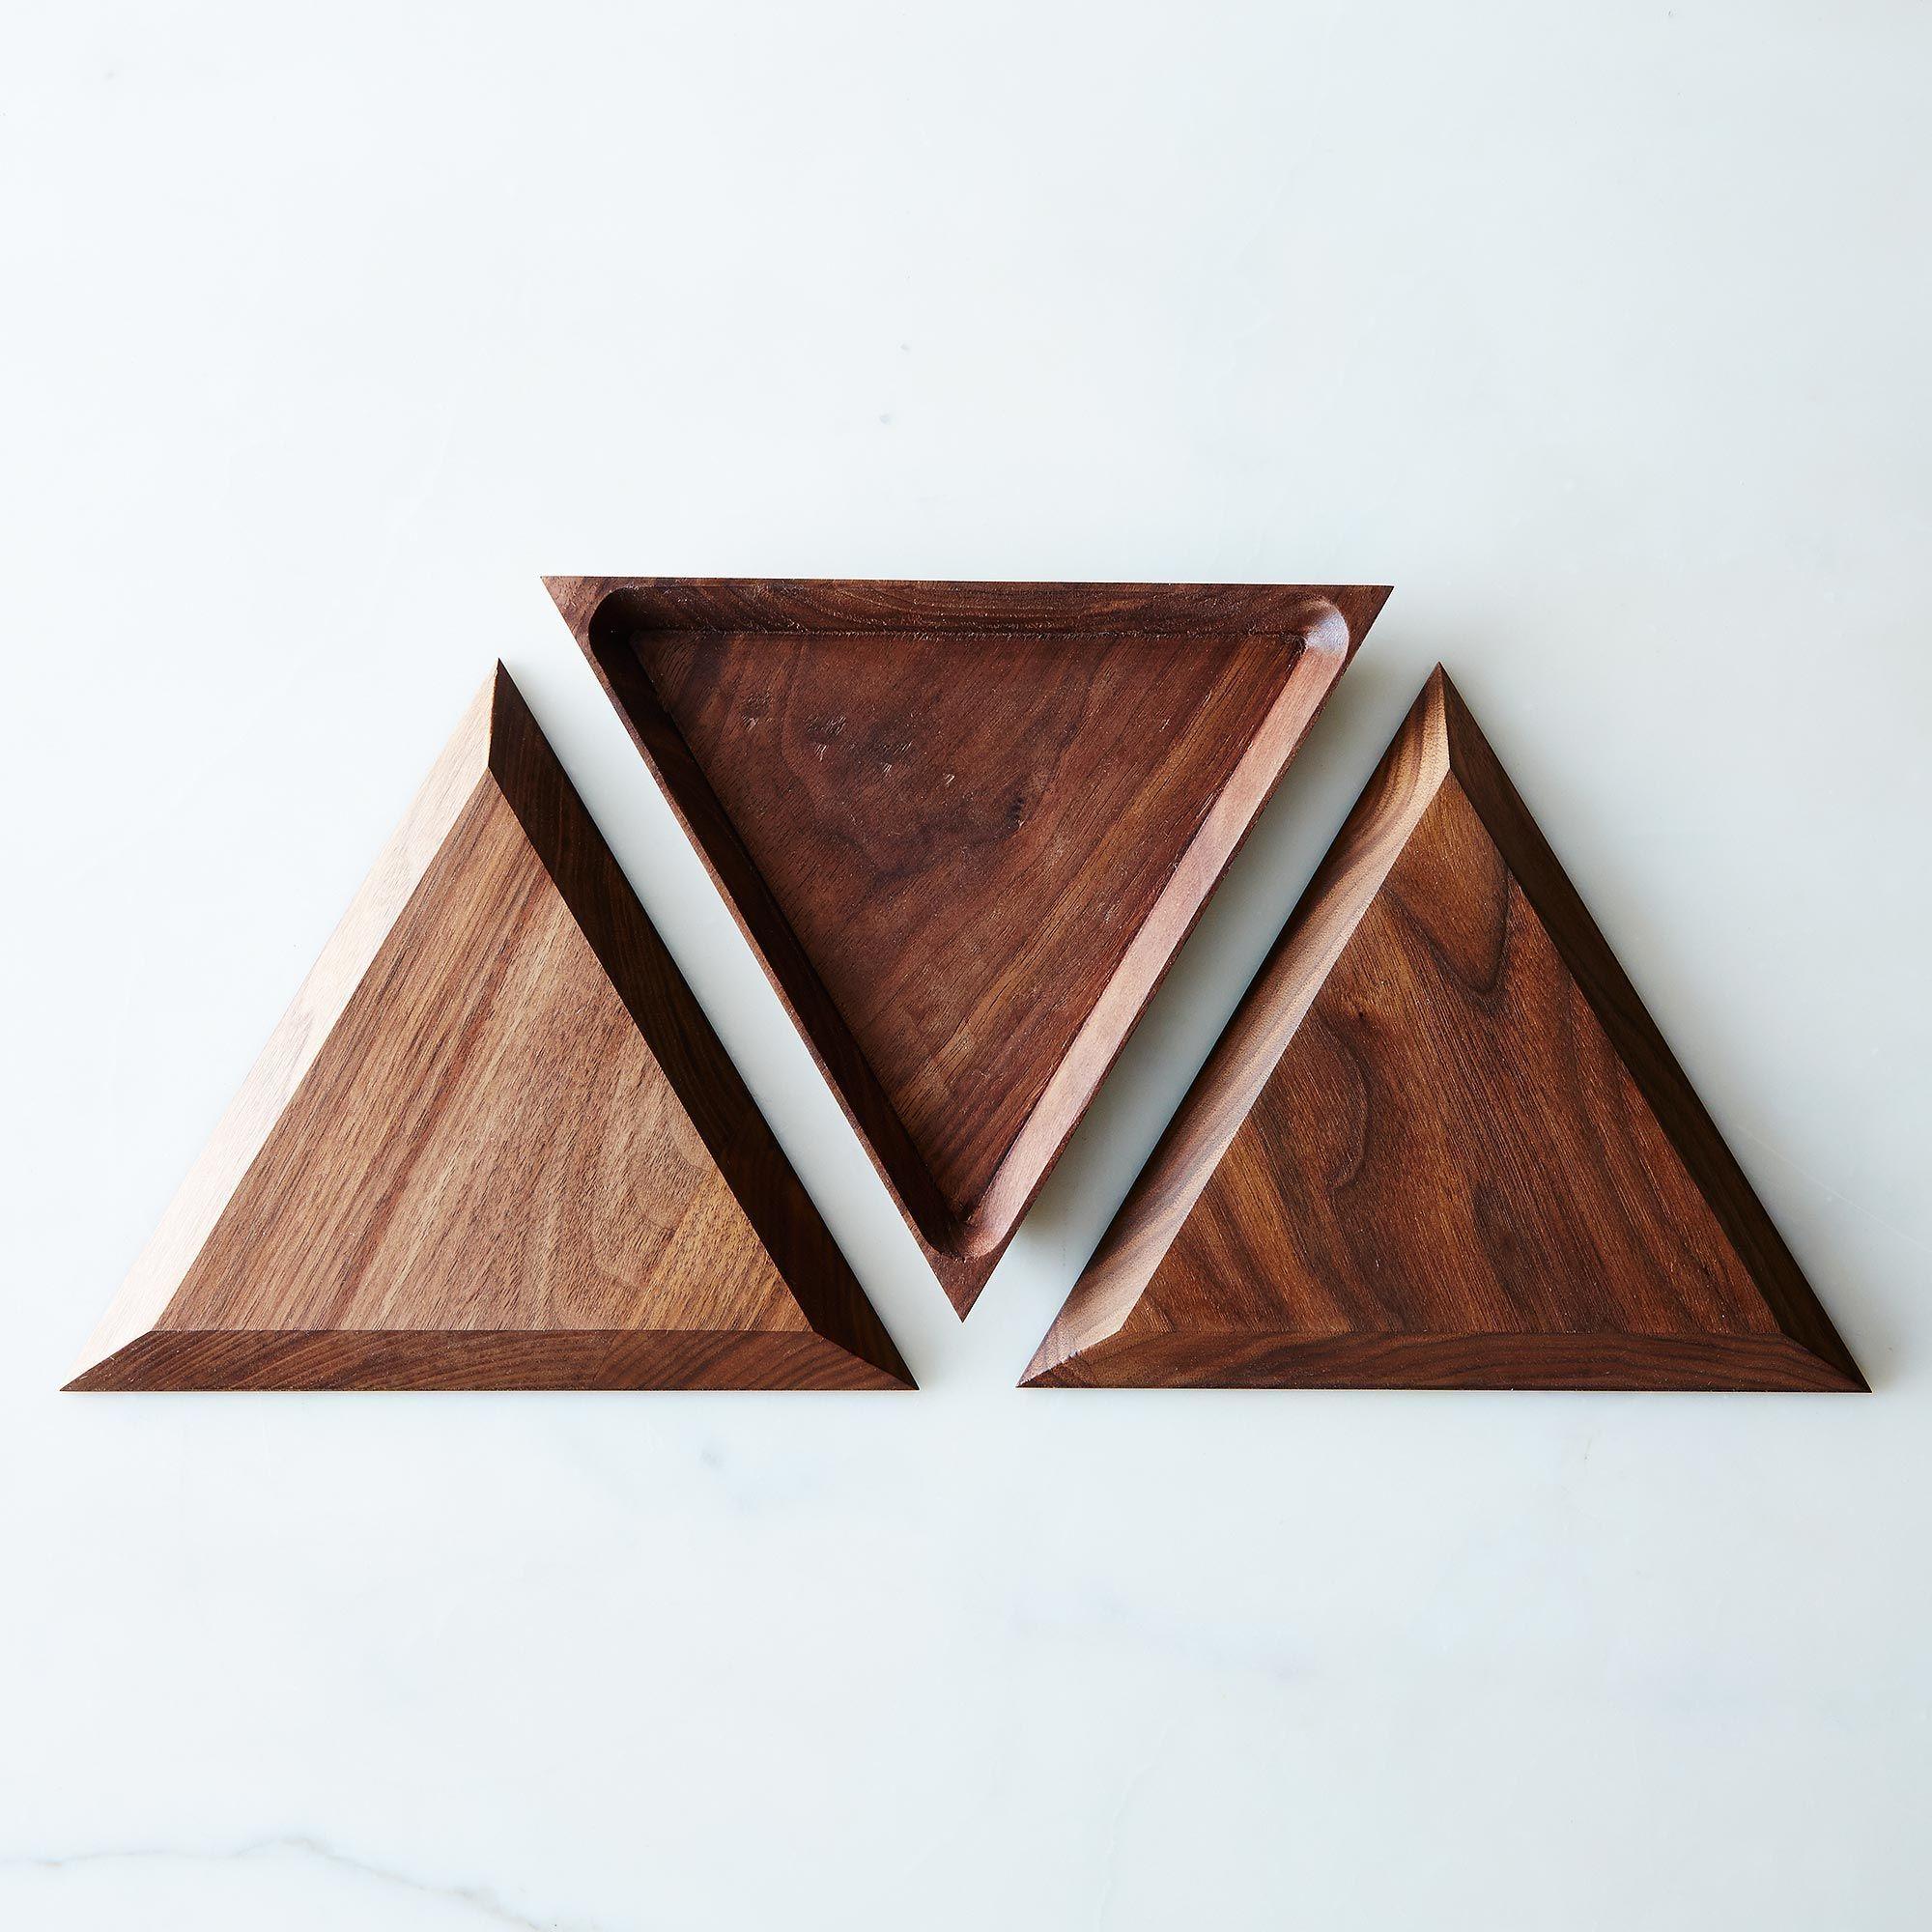 7b3a05b7 fdfa 4ed8 ae79 8638ece36c8c  2014 0711 triangle trivets 006